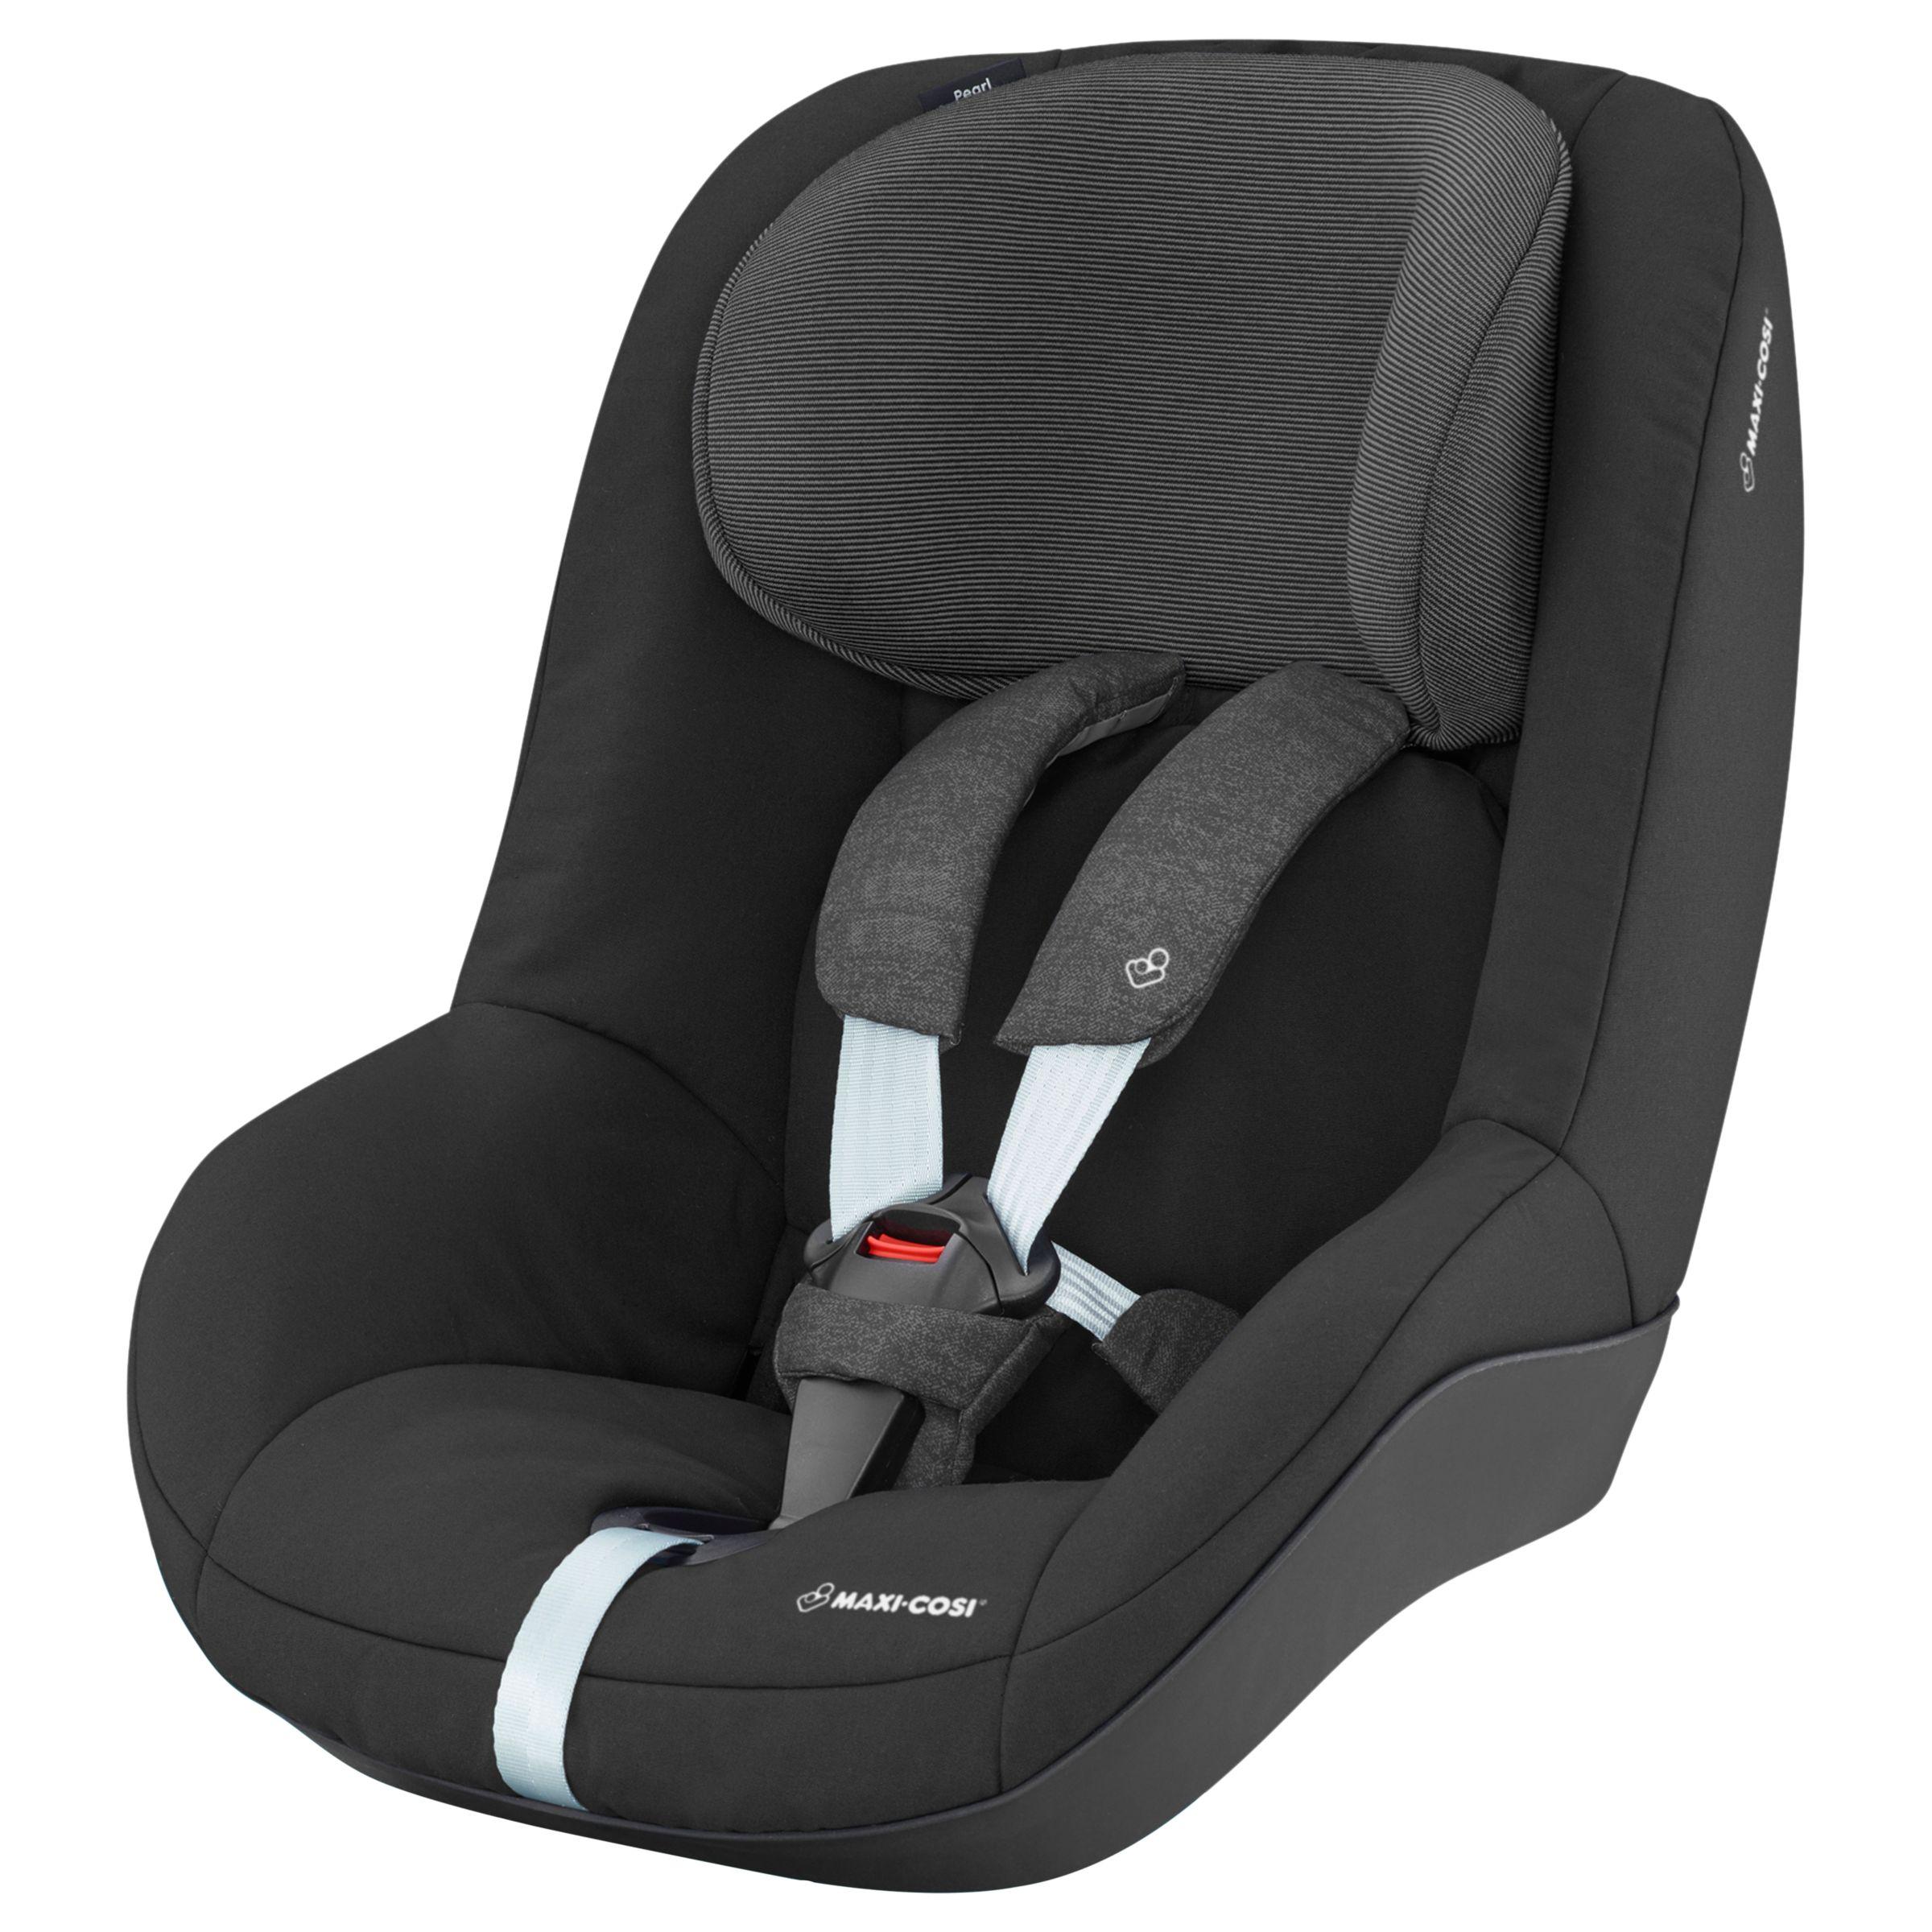 Maxi-Cosi Maxi-Cosi Pearl Group 1 Car Seat, Nomad Black